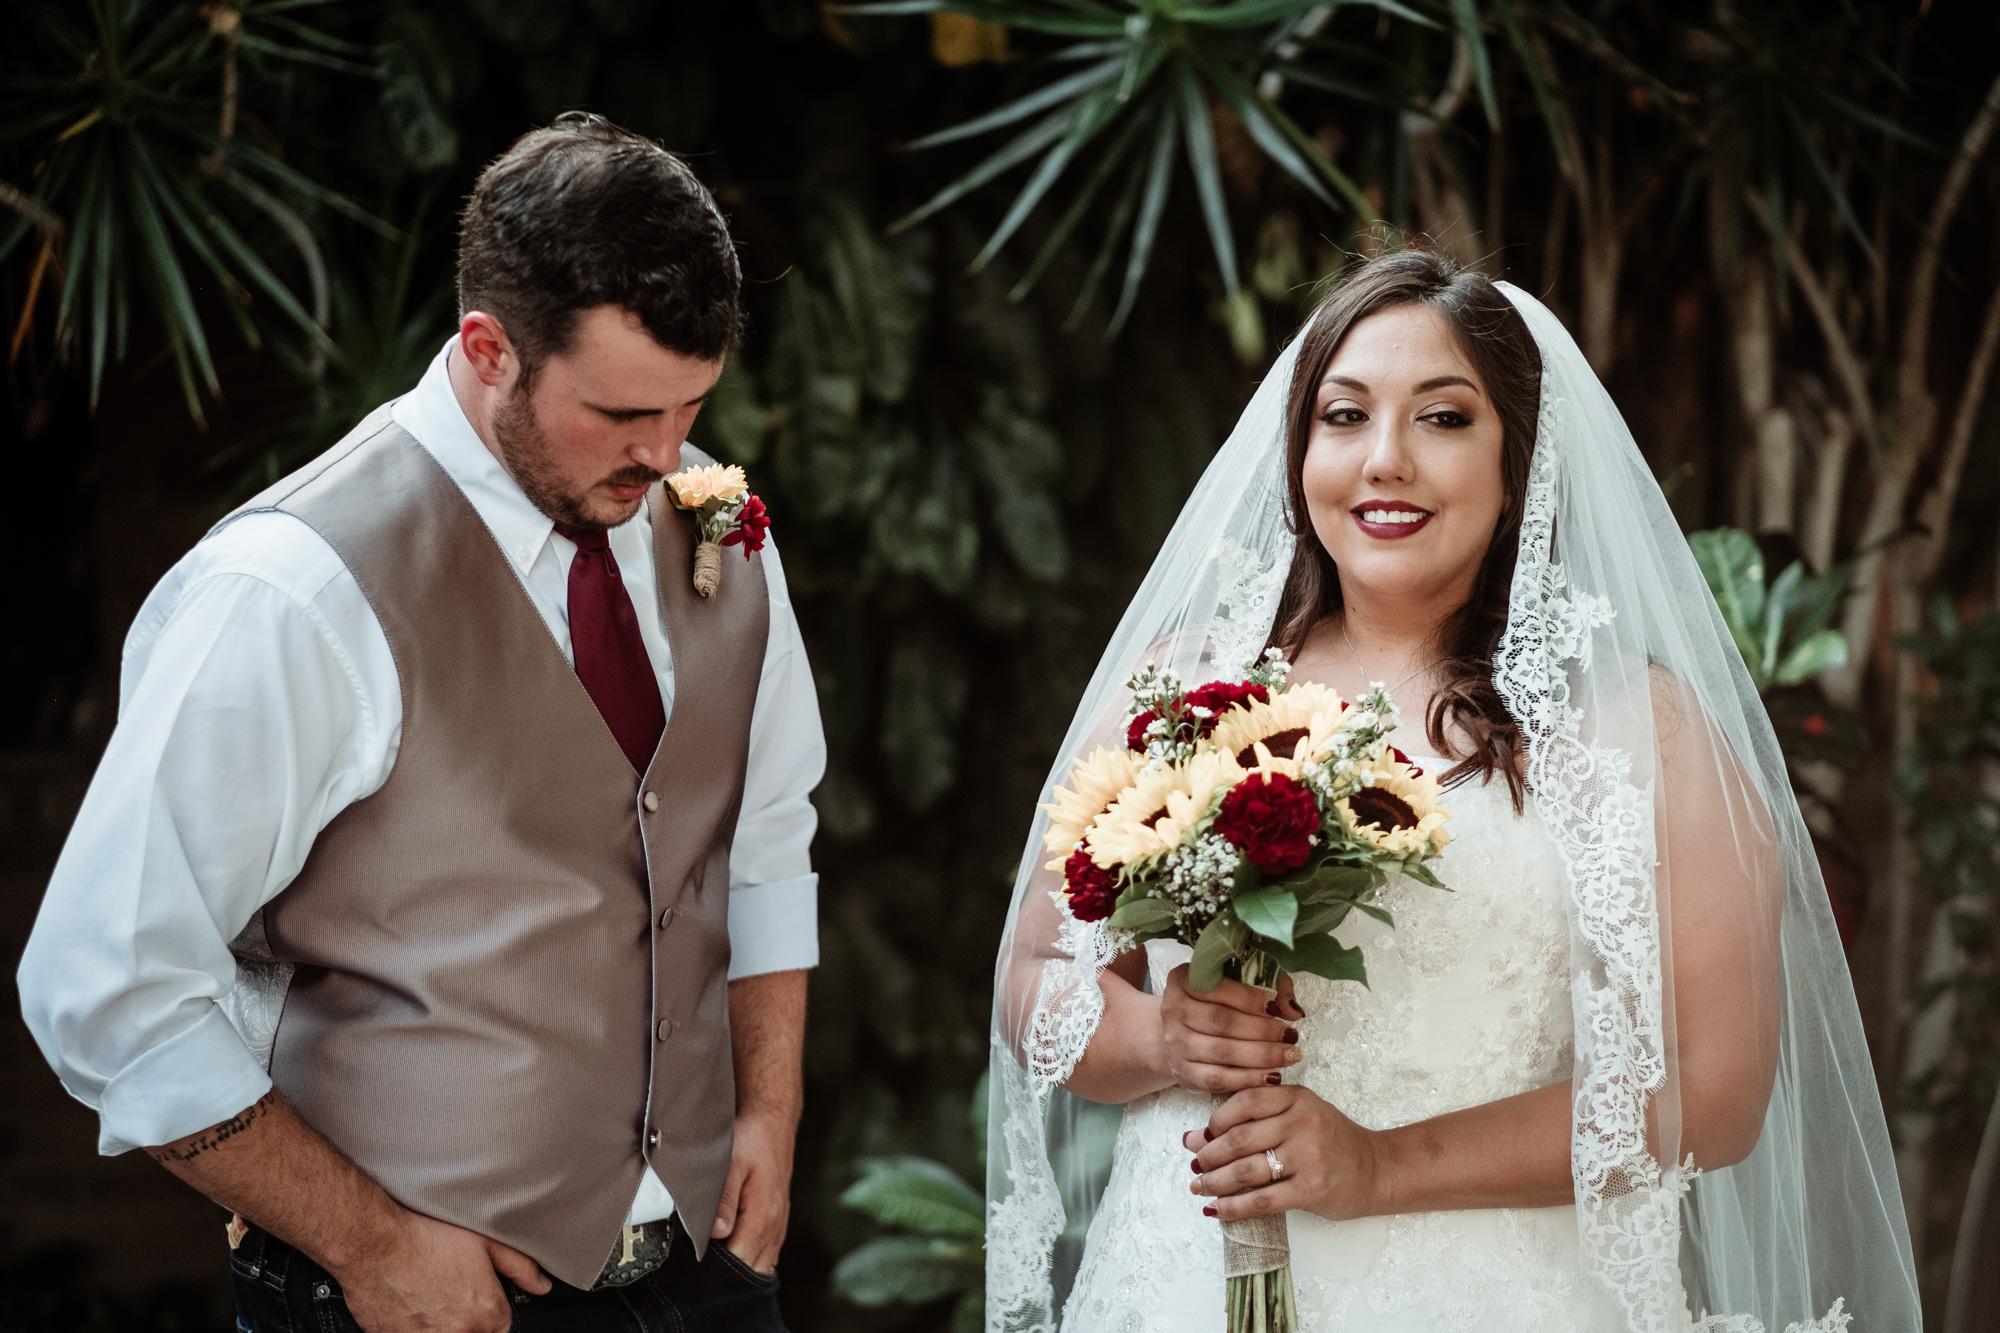 DallasAlyssa-Wedding-2019-JF-1210.jpg